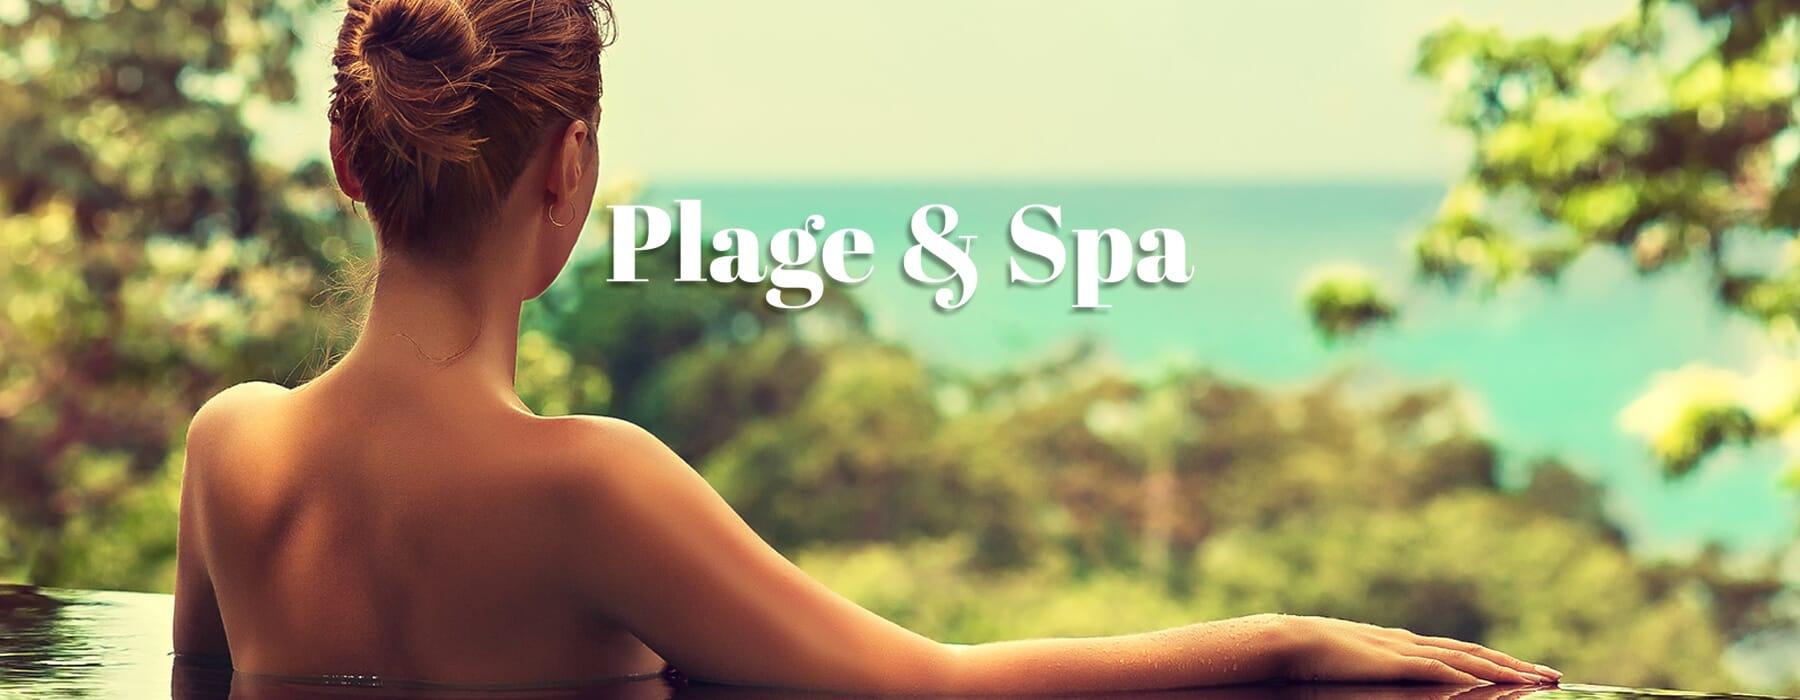 Plage & Spa